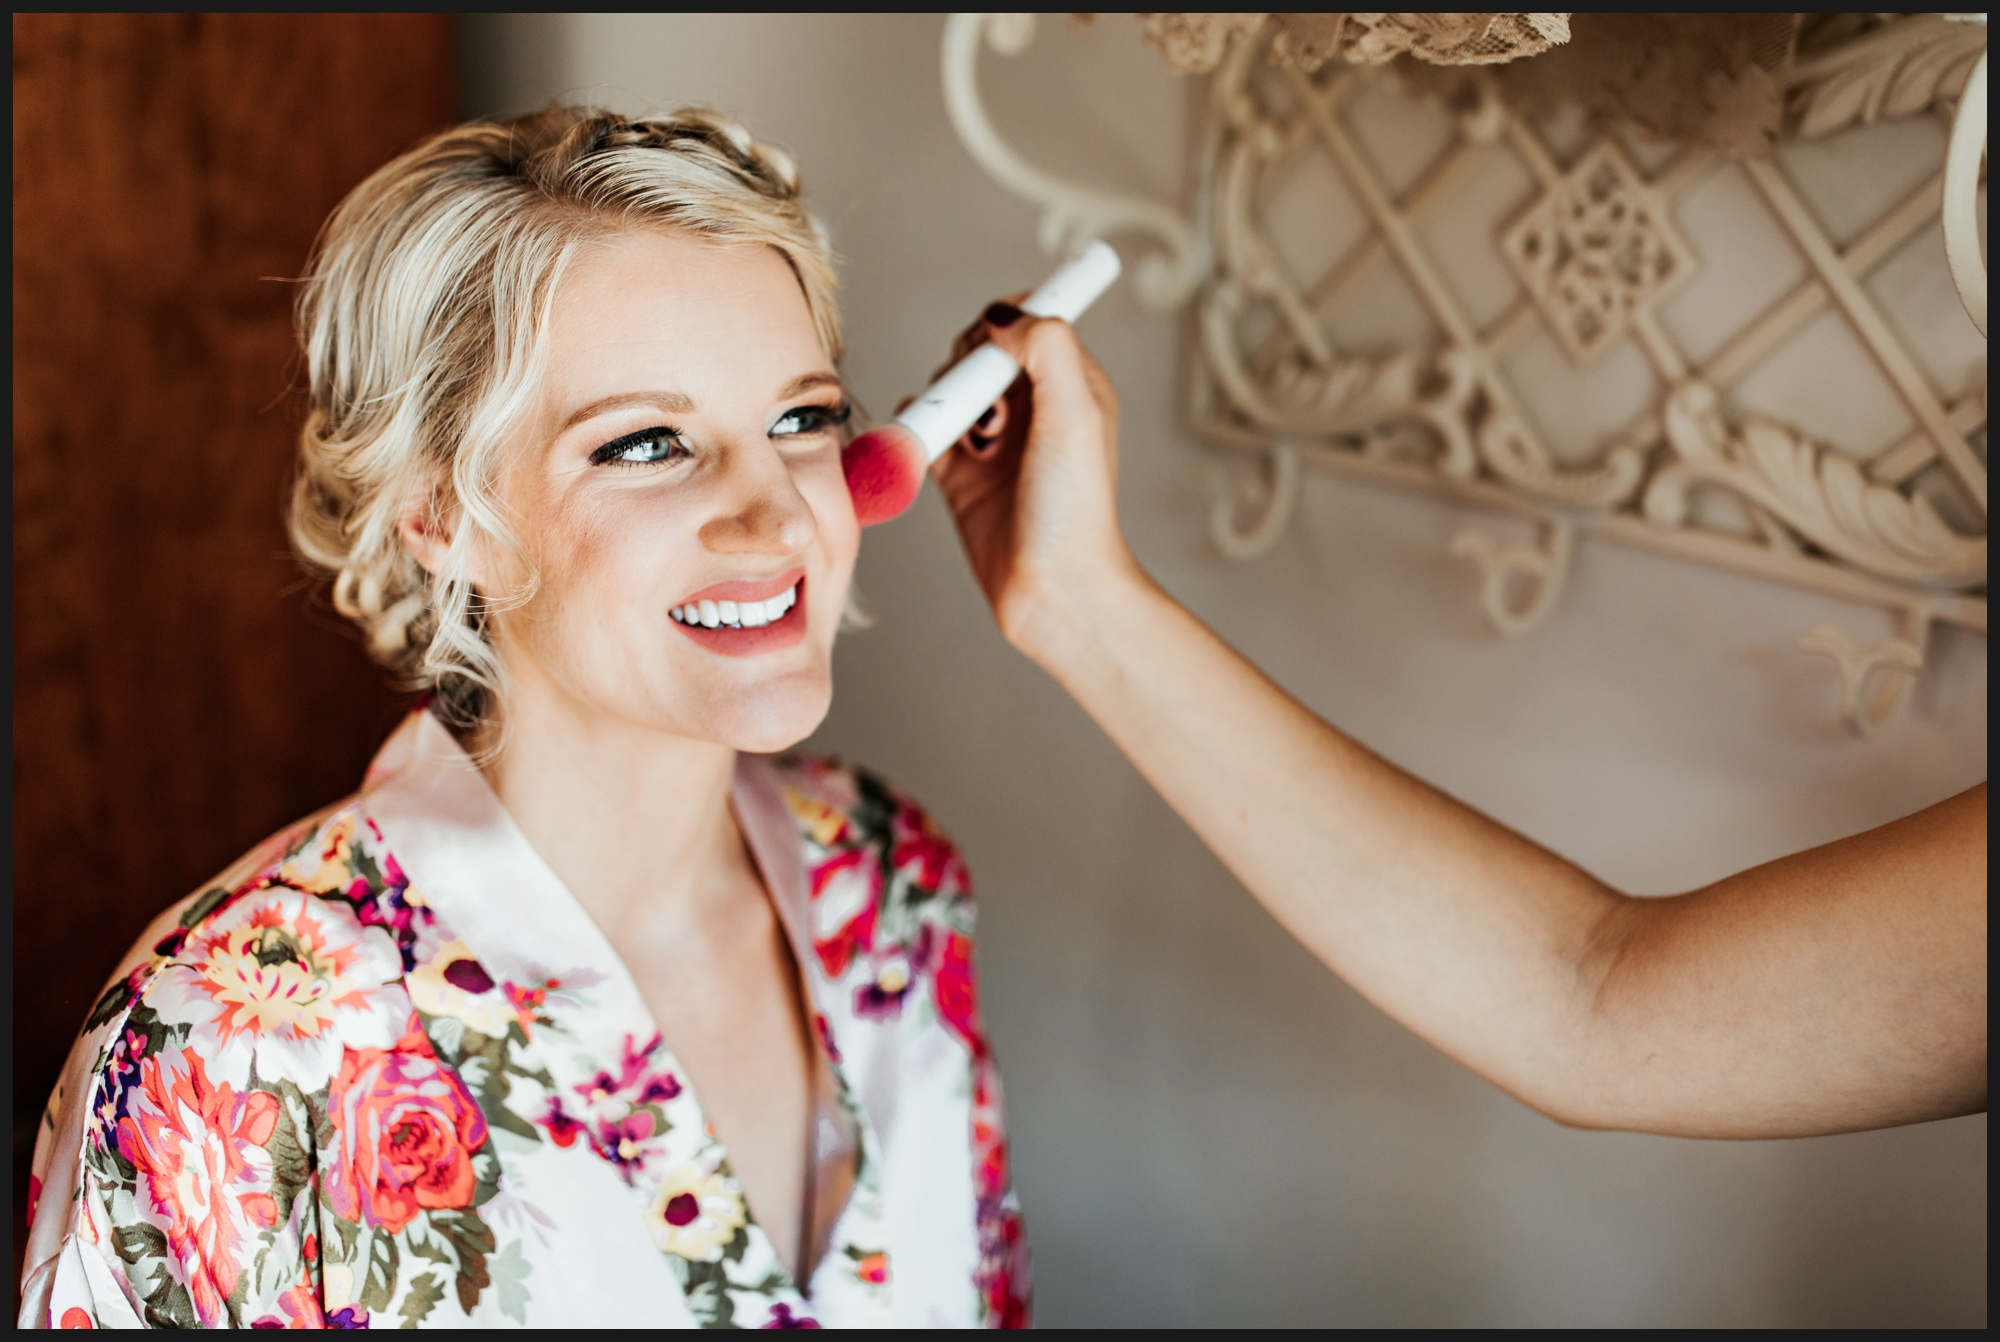 Orlando-Wedding-Photographer-destination-wedding-photographer-florida-wedding-photographer-hawaii-wedding-photographer_0559.jpg